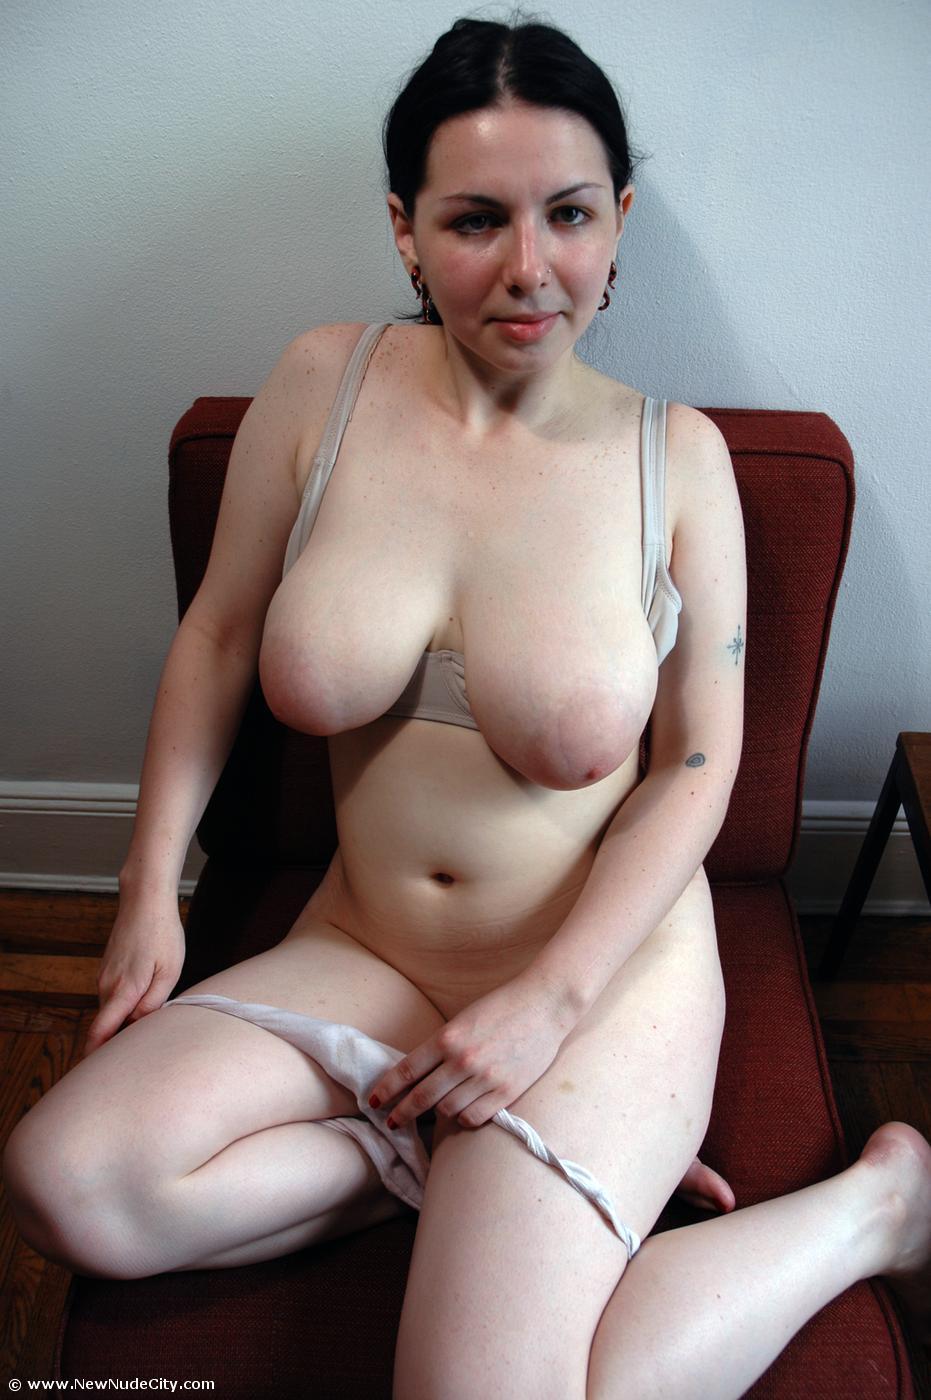 busty girl nude pink